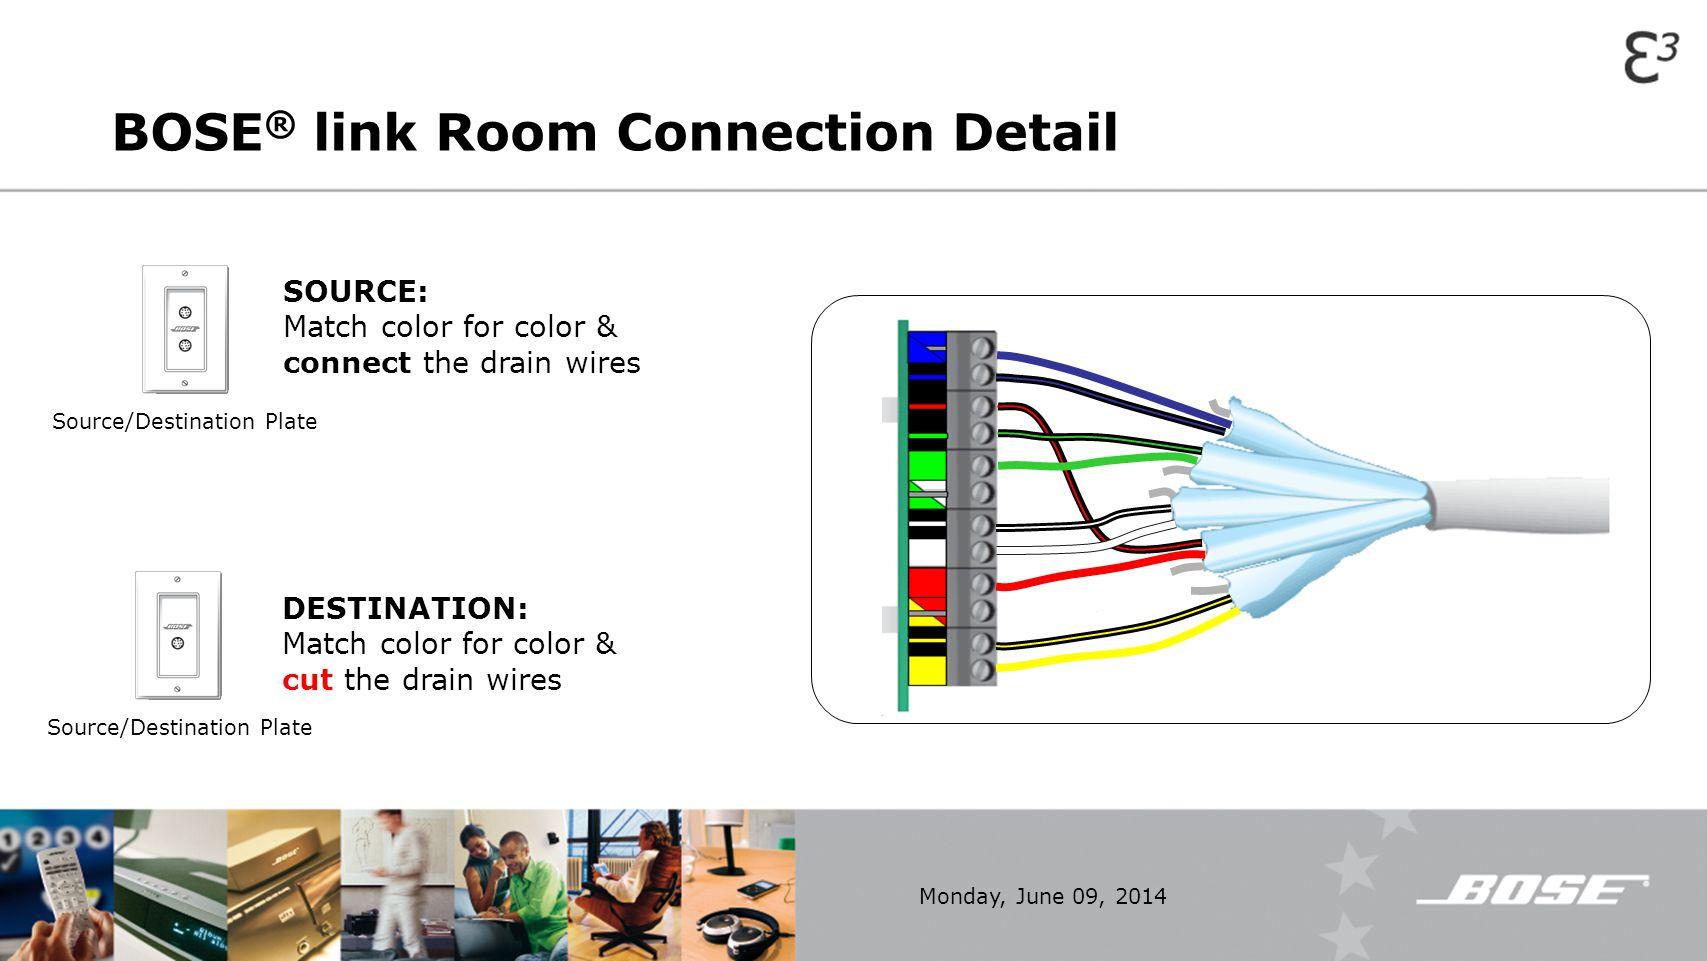 9 Pin Bose Wiring Diagram Electrical House 15 Vga Xlr Cable Panion Dual Link Rh Plasmapen Co Plug Usb To